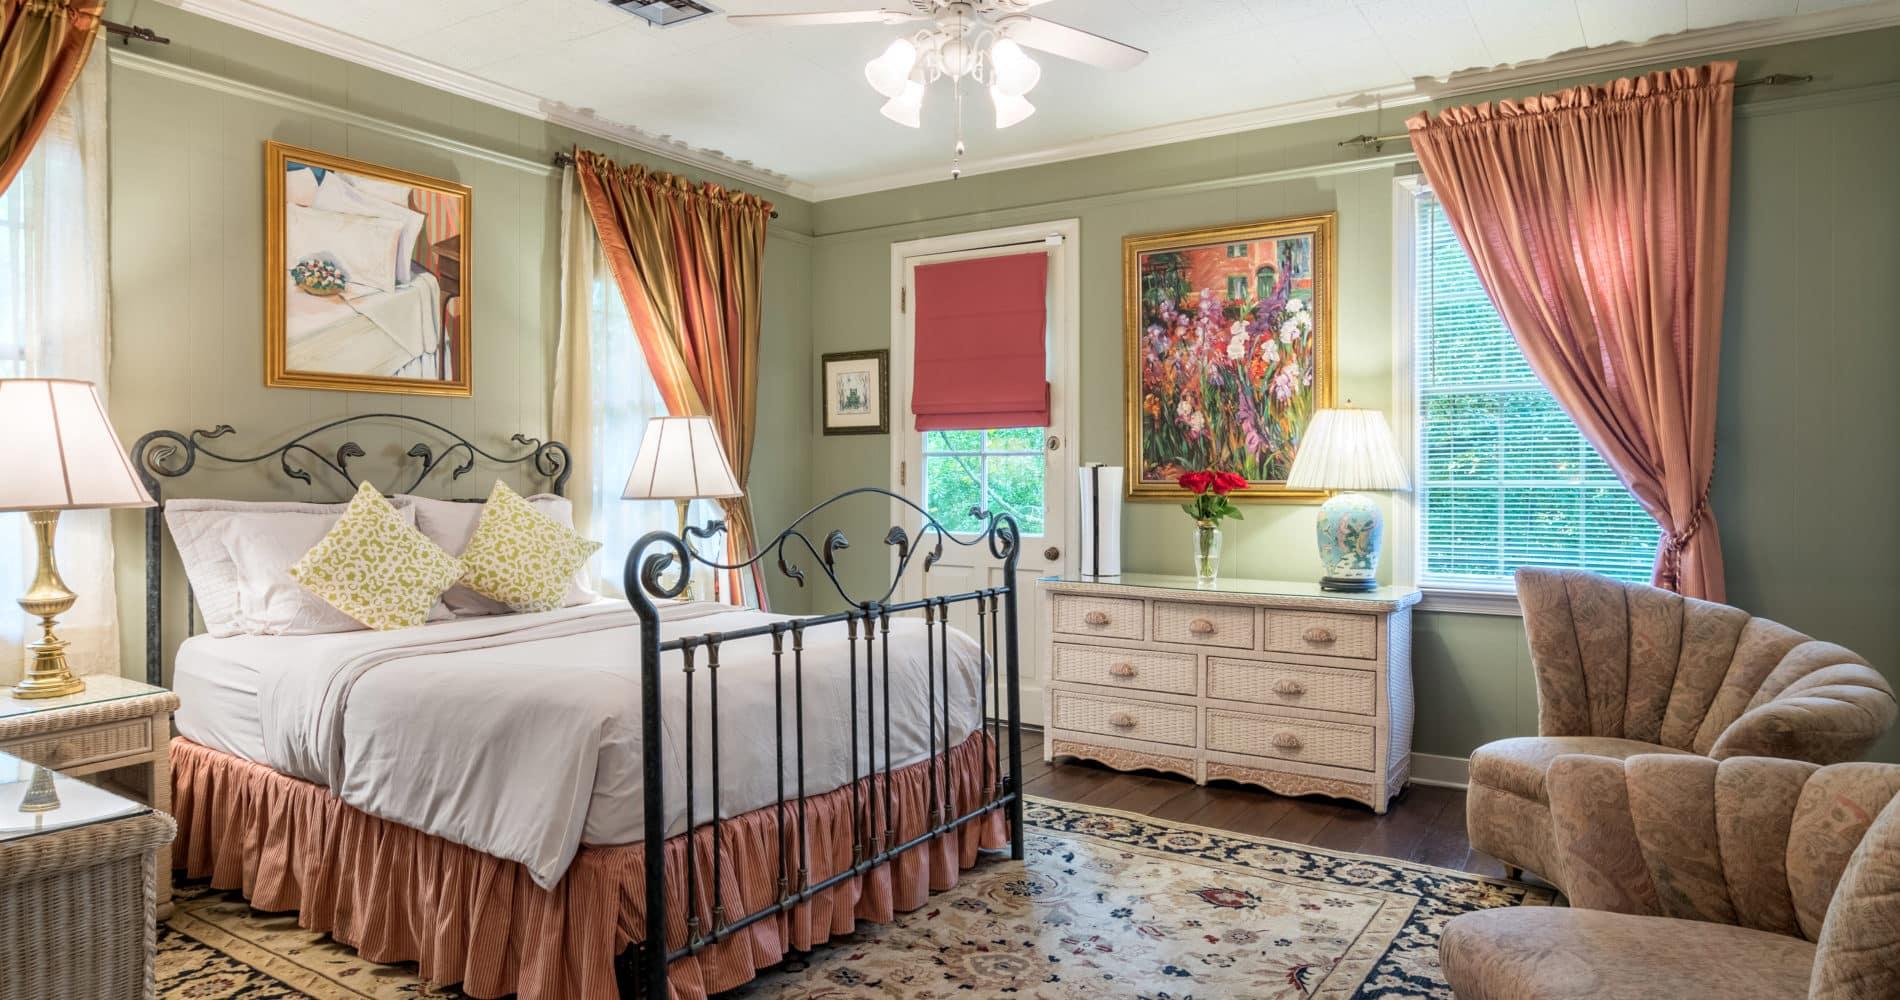 Garden Room with wrought iron queen bed, dresser, sitting area